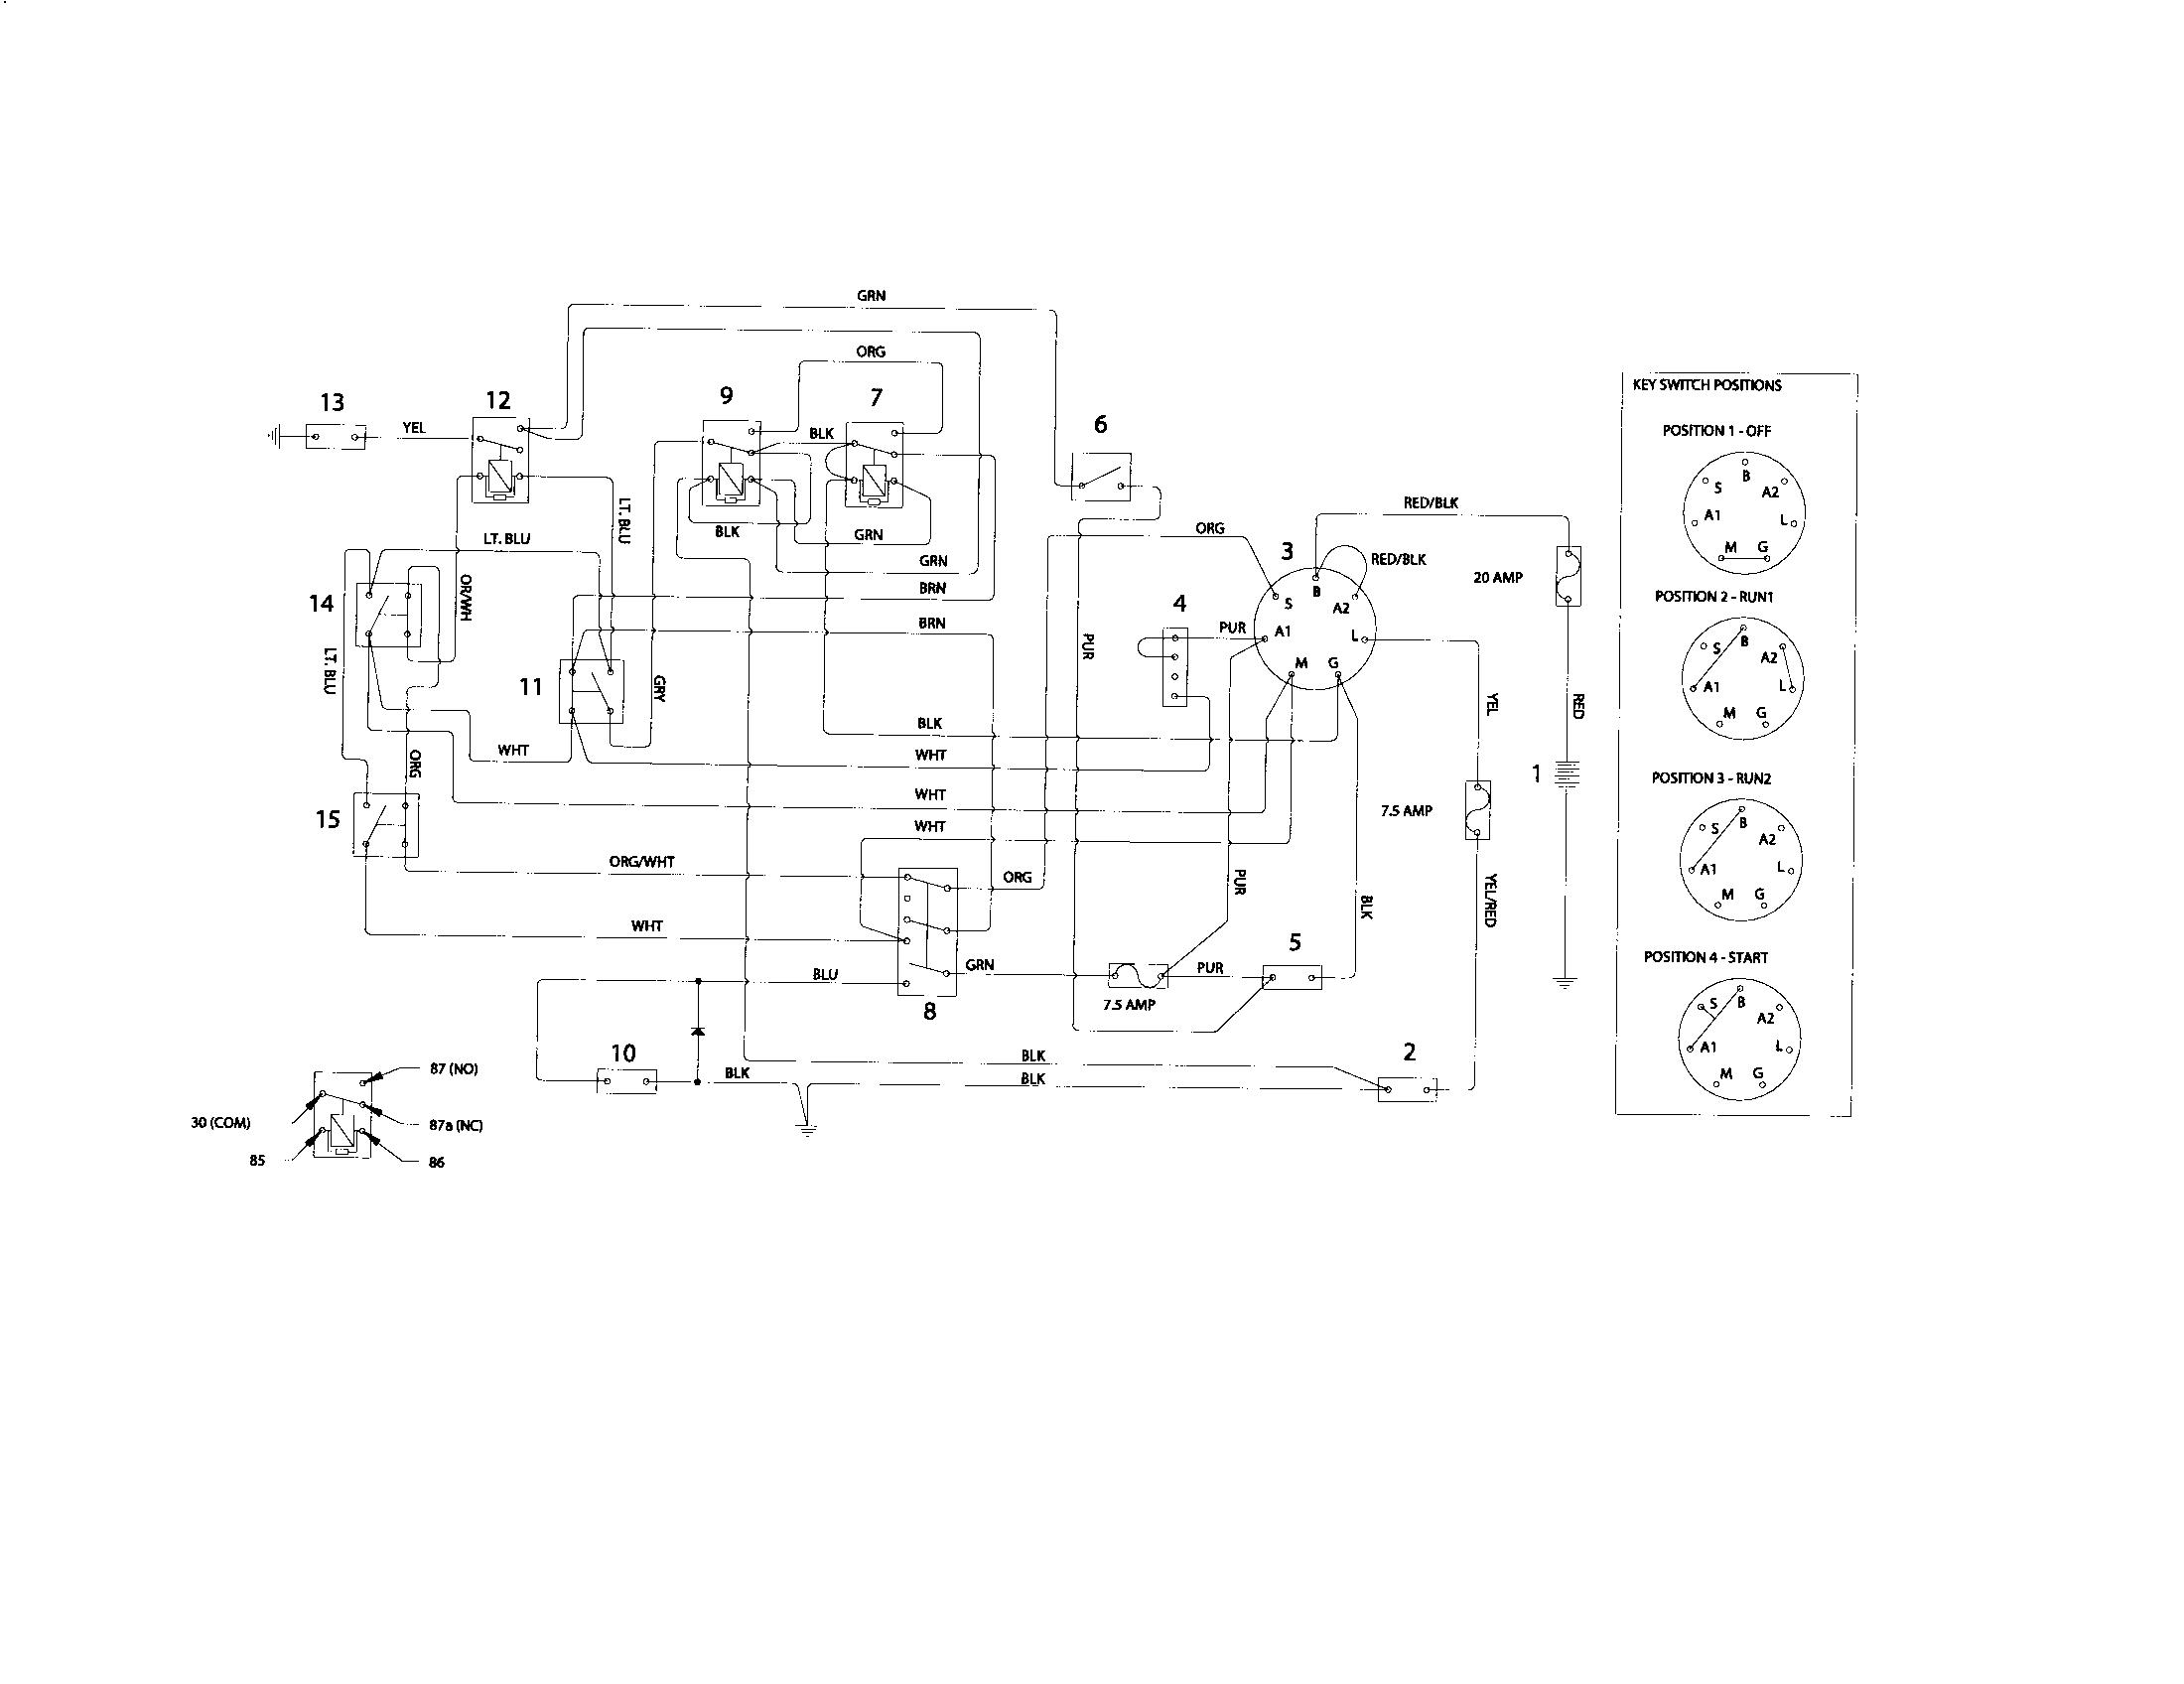 hight resolution of looking for husqvarna model z5426 968999508 rear engine riding mowerhusqvarna z5426 968999508 schematic diagram diagram